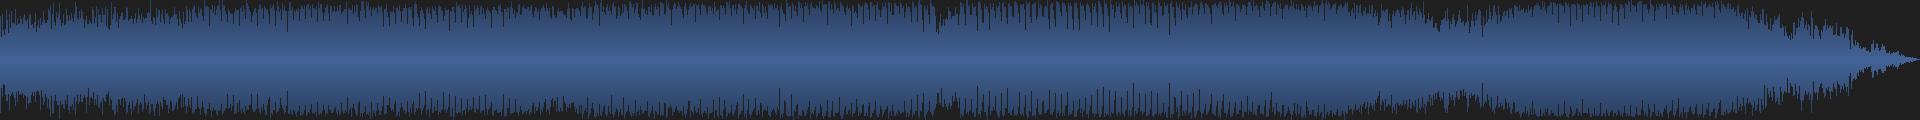 Fdc hypnotic full mix 135bpm